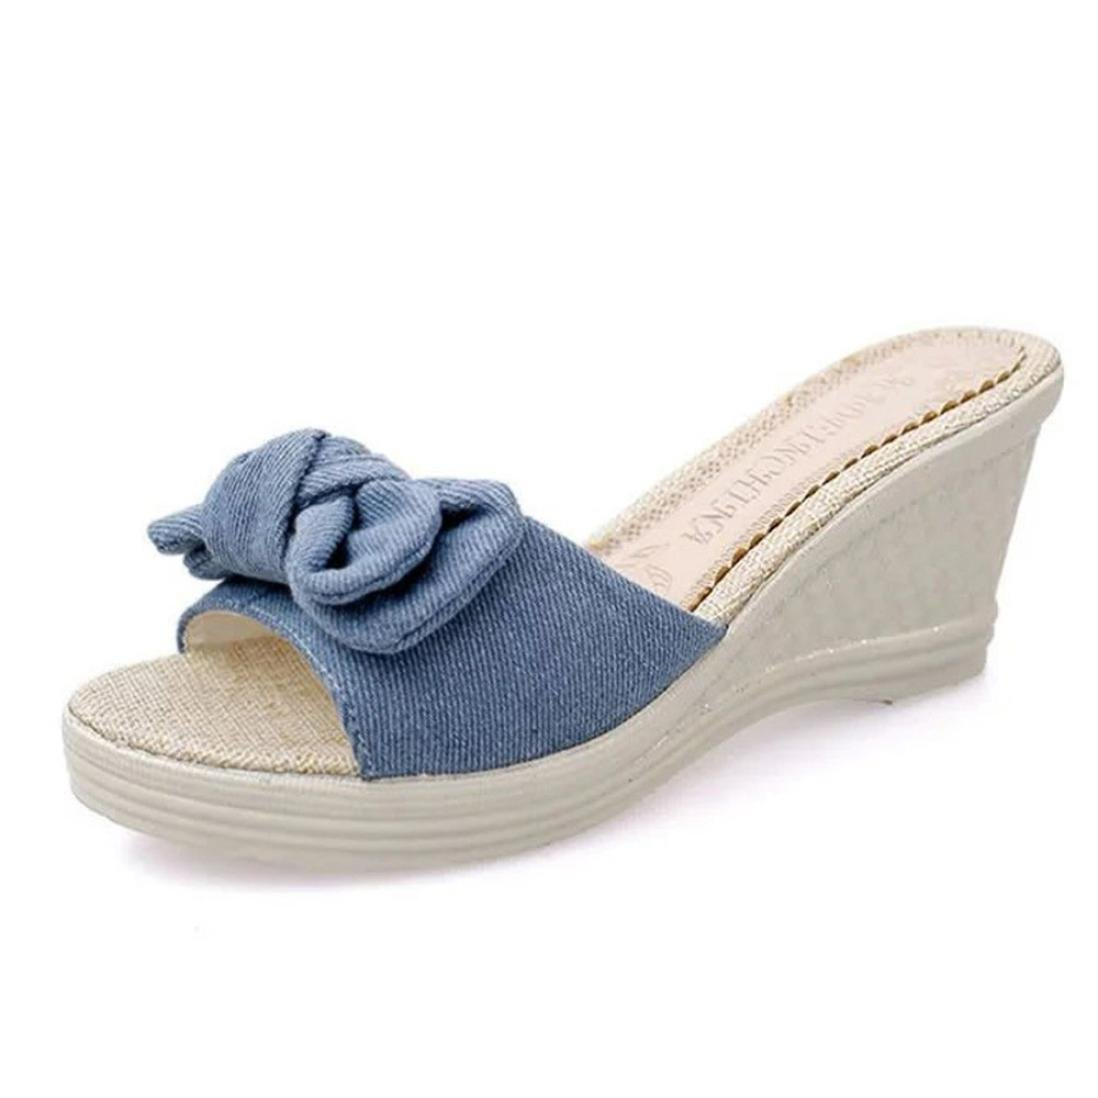 baigoodsホットセール。レディースファッション蝶魚口透明フラット靴カジュアル靴butterfly-knot透明サンダル B07BX78K4J  ブルー US:7